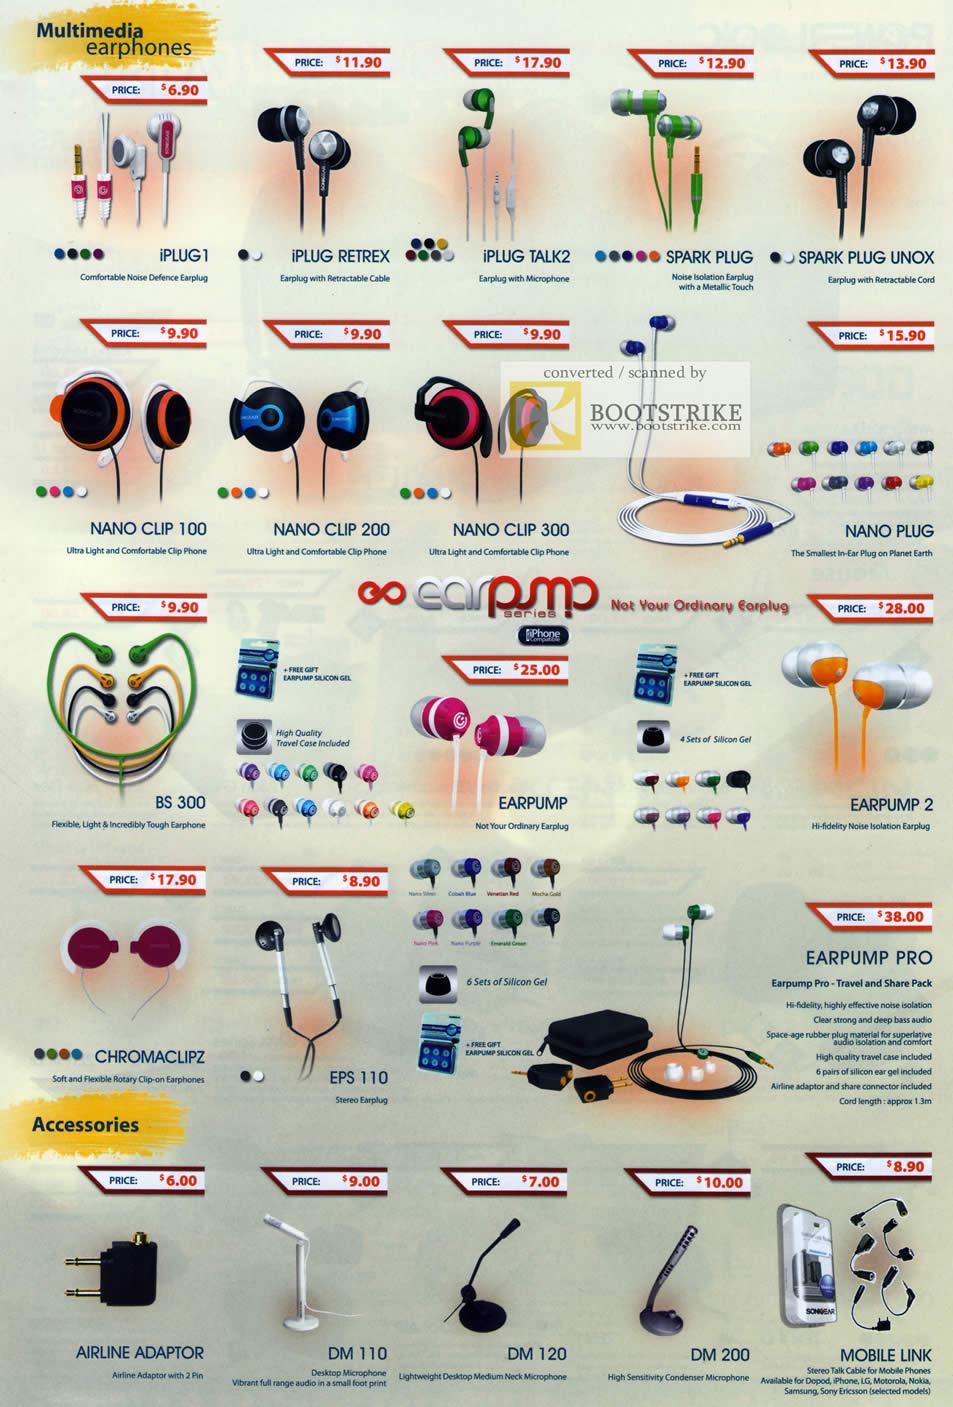 PC Show 2011 price list image brochure of Leapfrog Powerlogic Earphones IPLUG Retrex Talk2 Spark Unox Nano Clip Plug BS 300 Earpump Chromaclipz EPS Pro DM Airline Adaptor